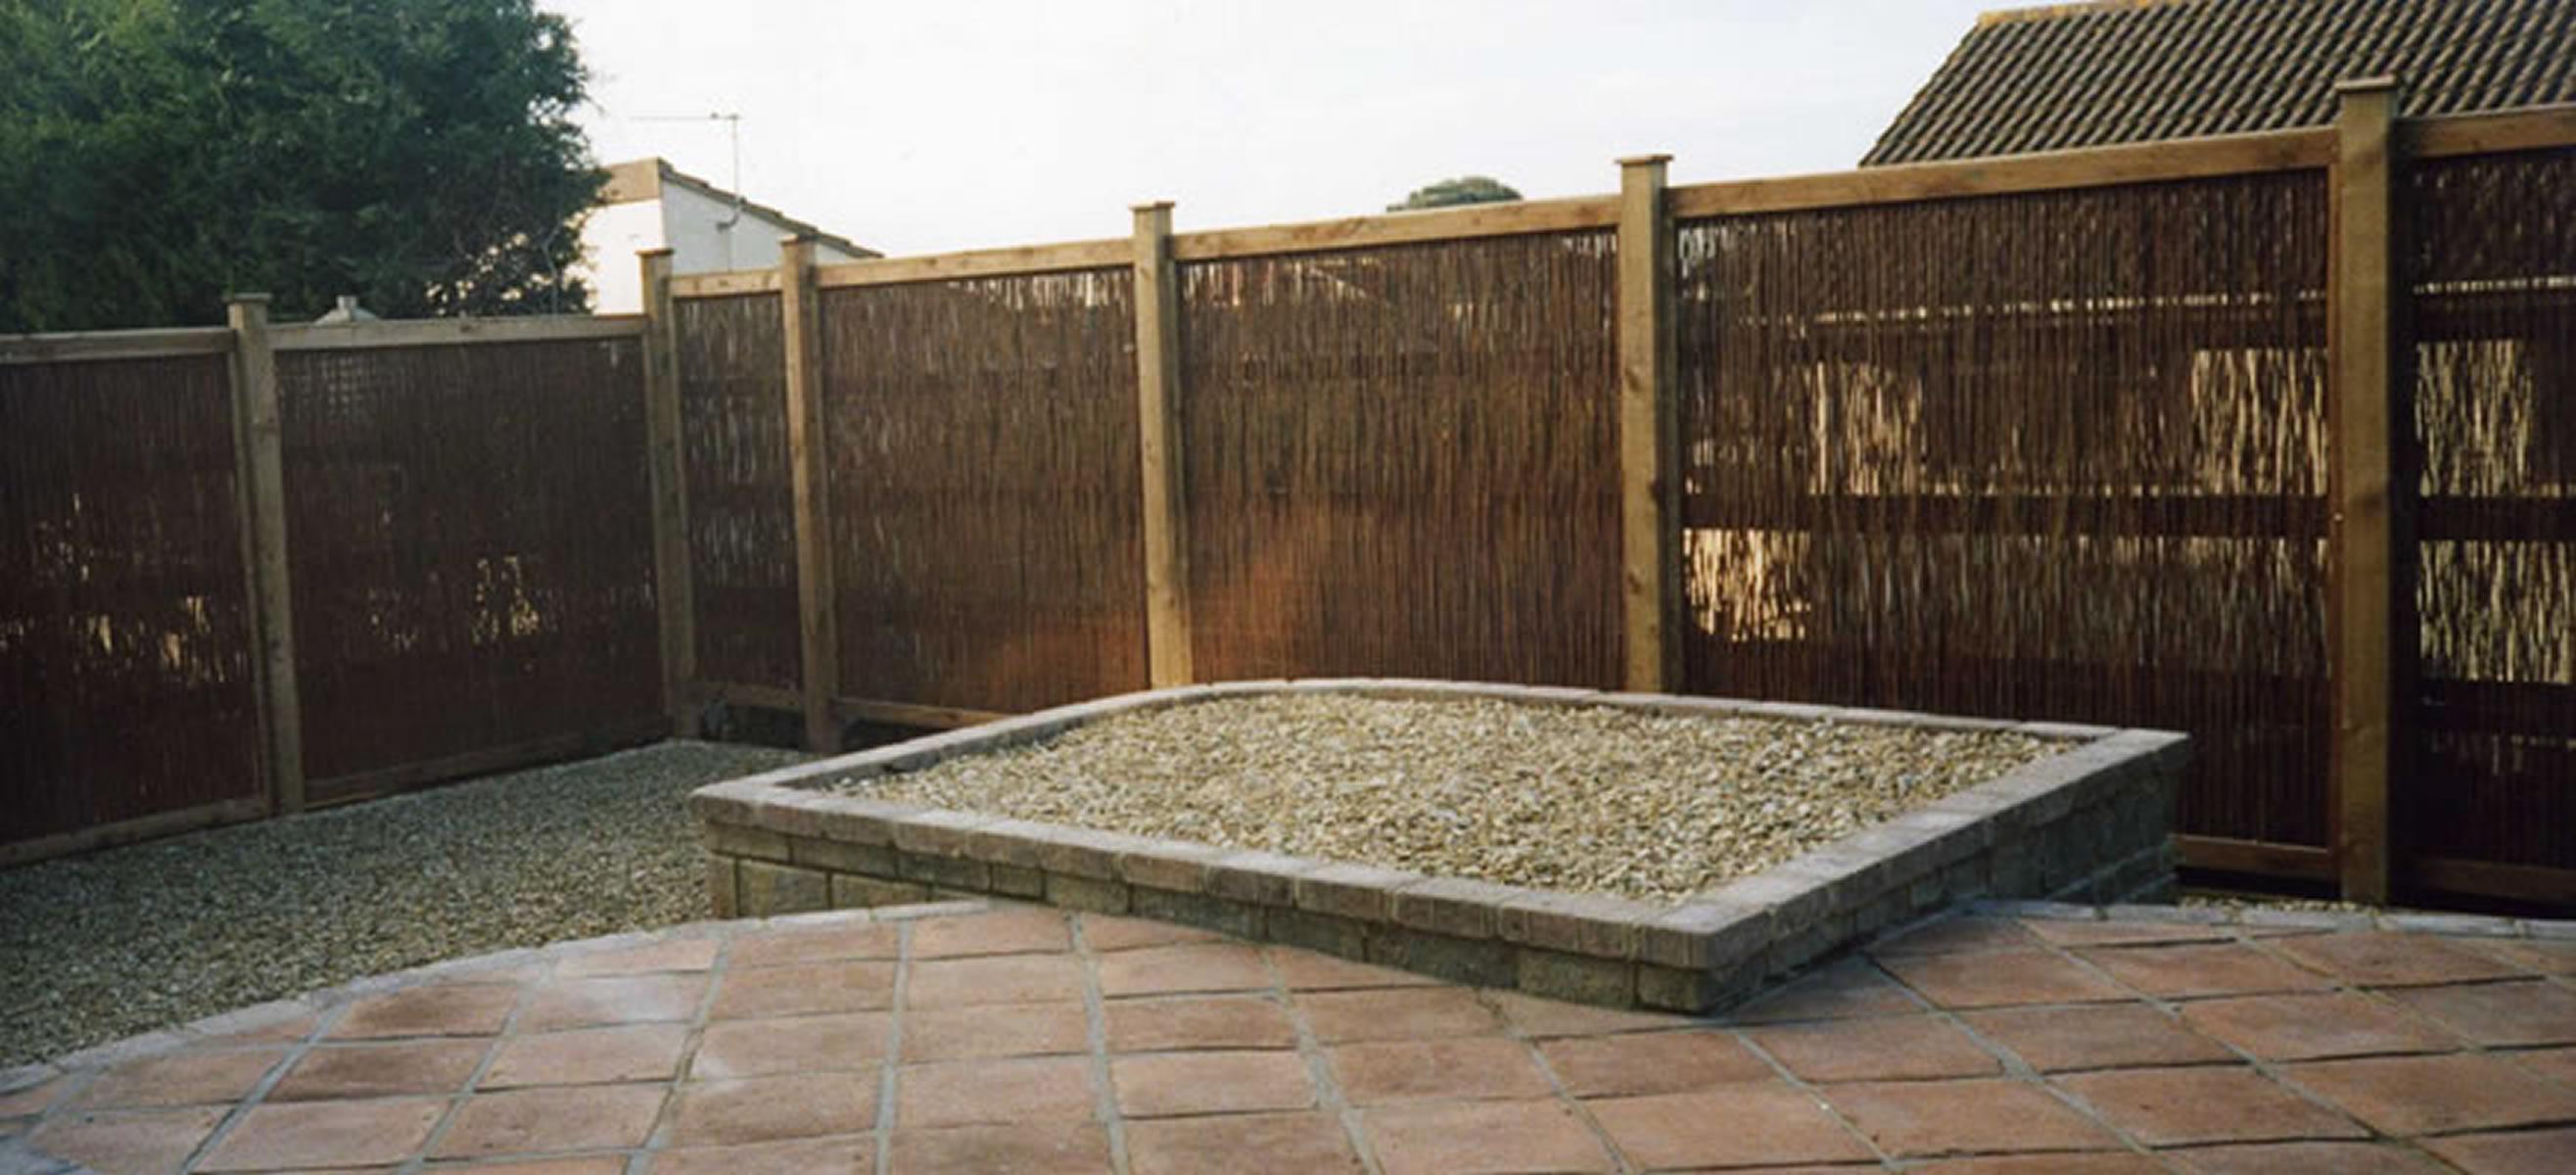 Decking fencing pergolas j01 pa sloan garden for Garden decking and fencing